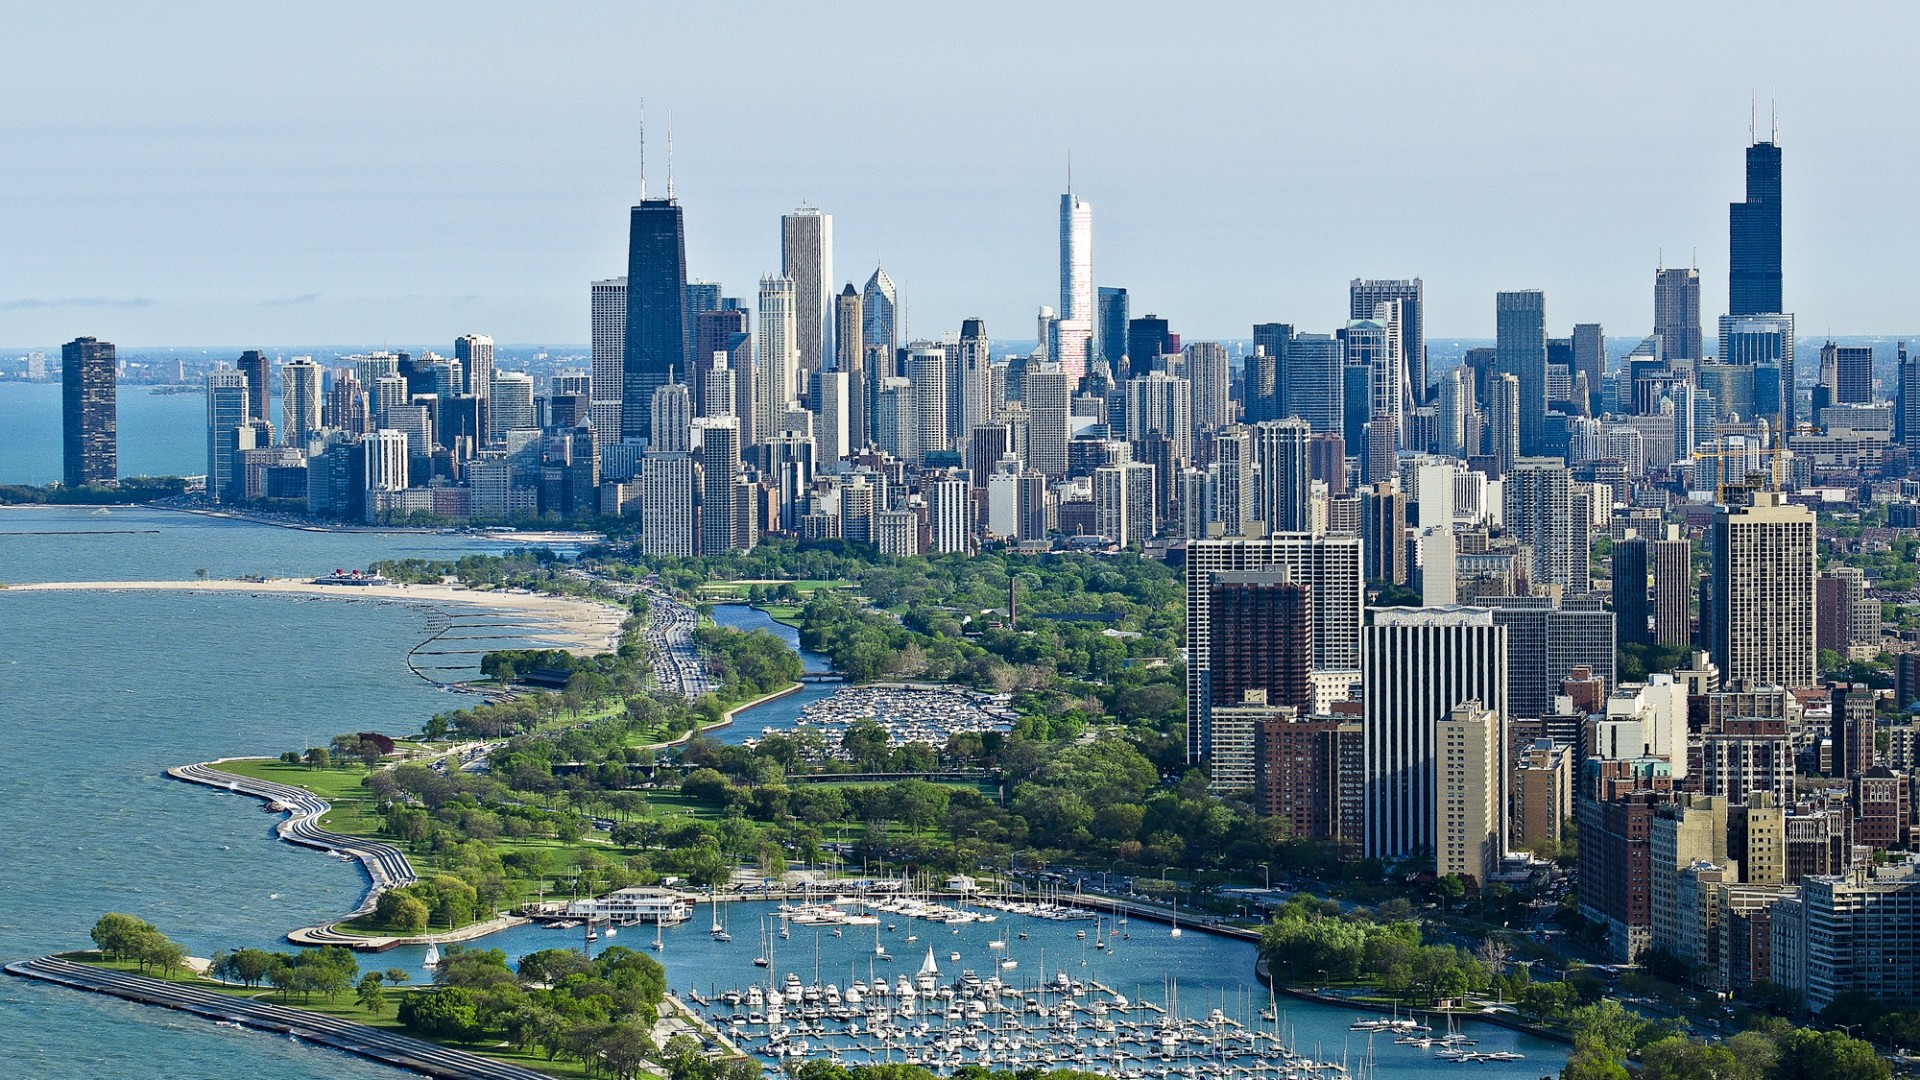 … Background Full HD 1080p. Wallpaper chicago, skyscrapers, top  view, ocean